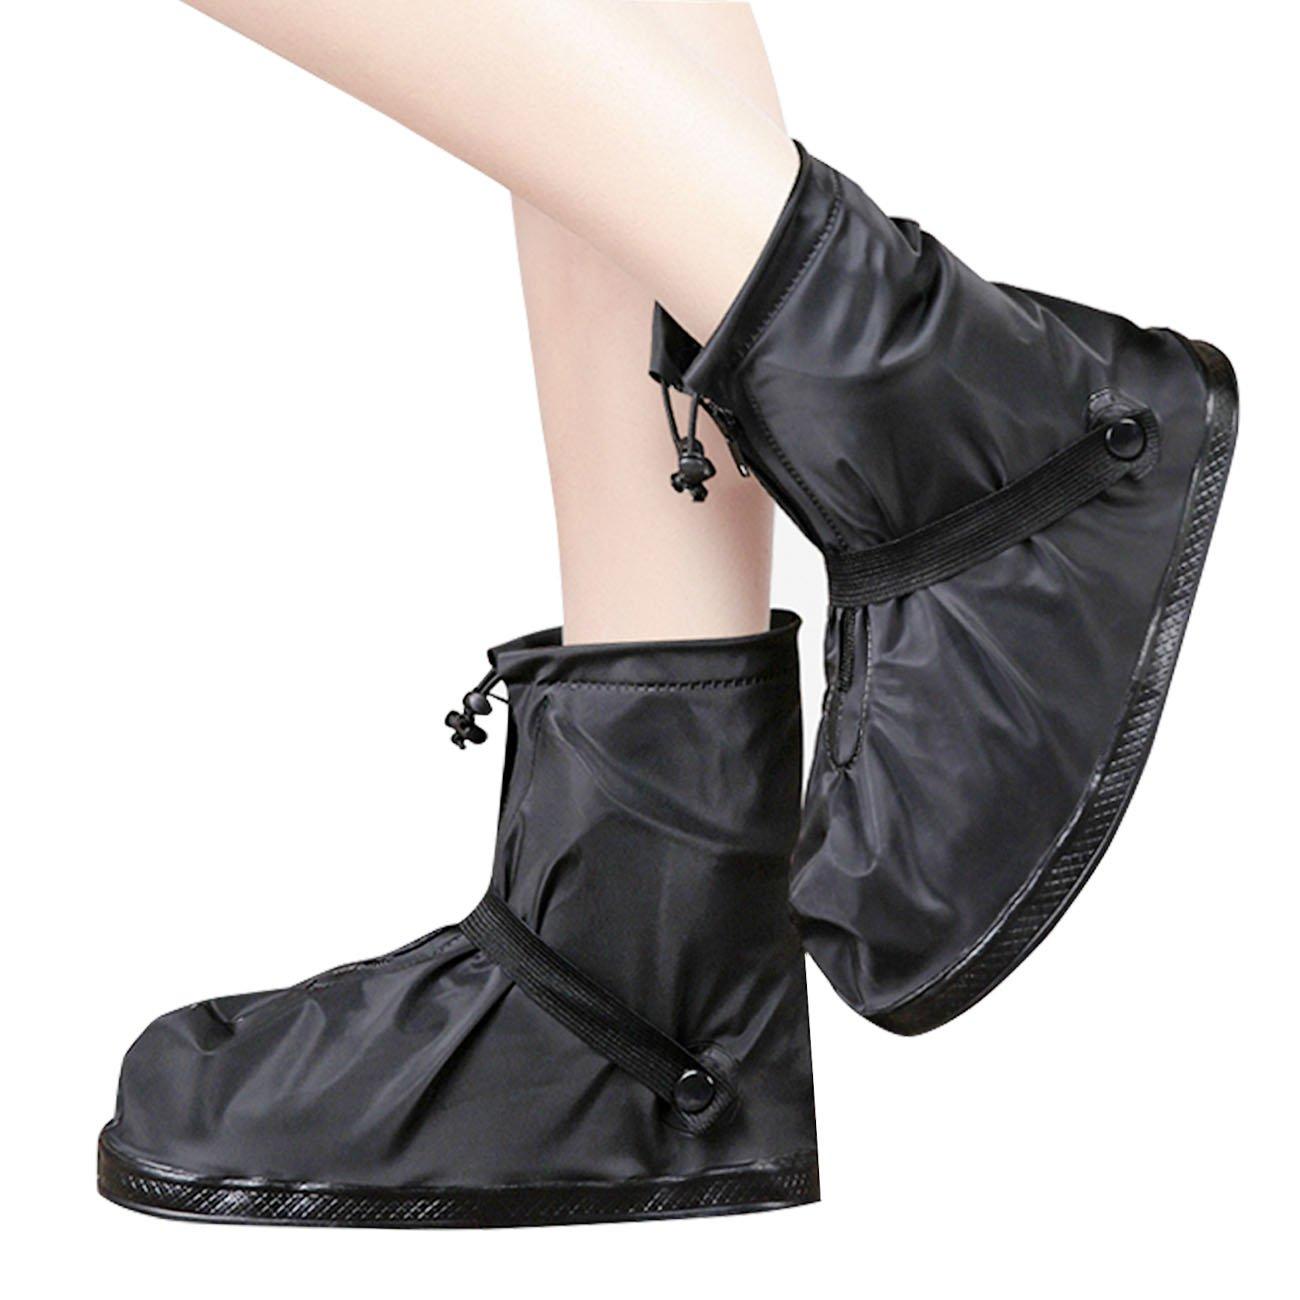 Life-C Black Waterproof Snow Rain Shoes Covers Women Men XXXXL by Life-C (Image #6)